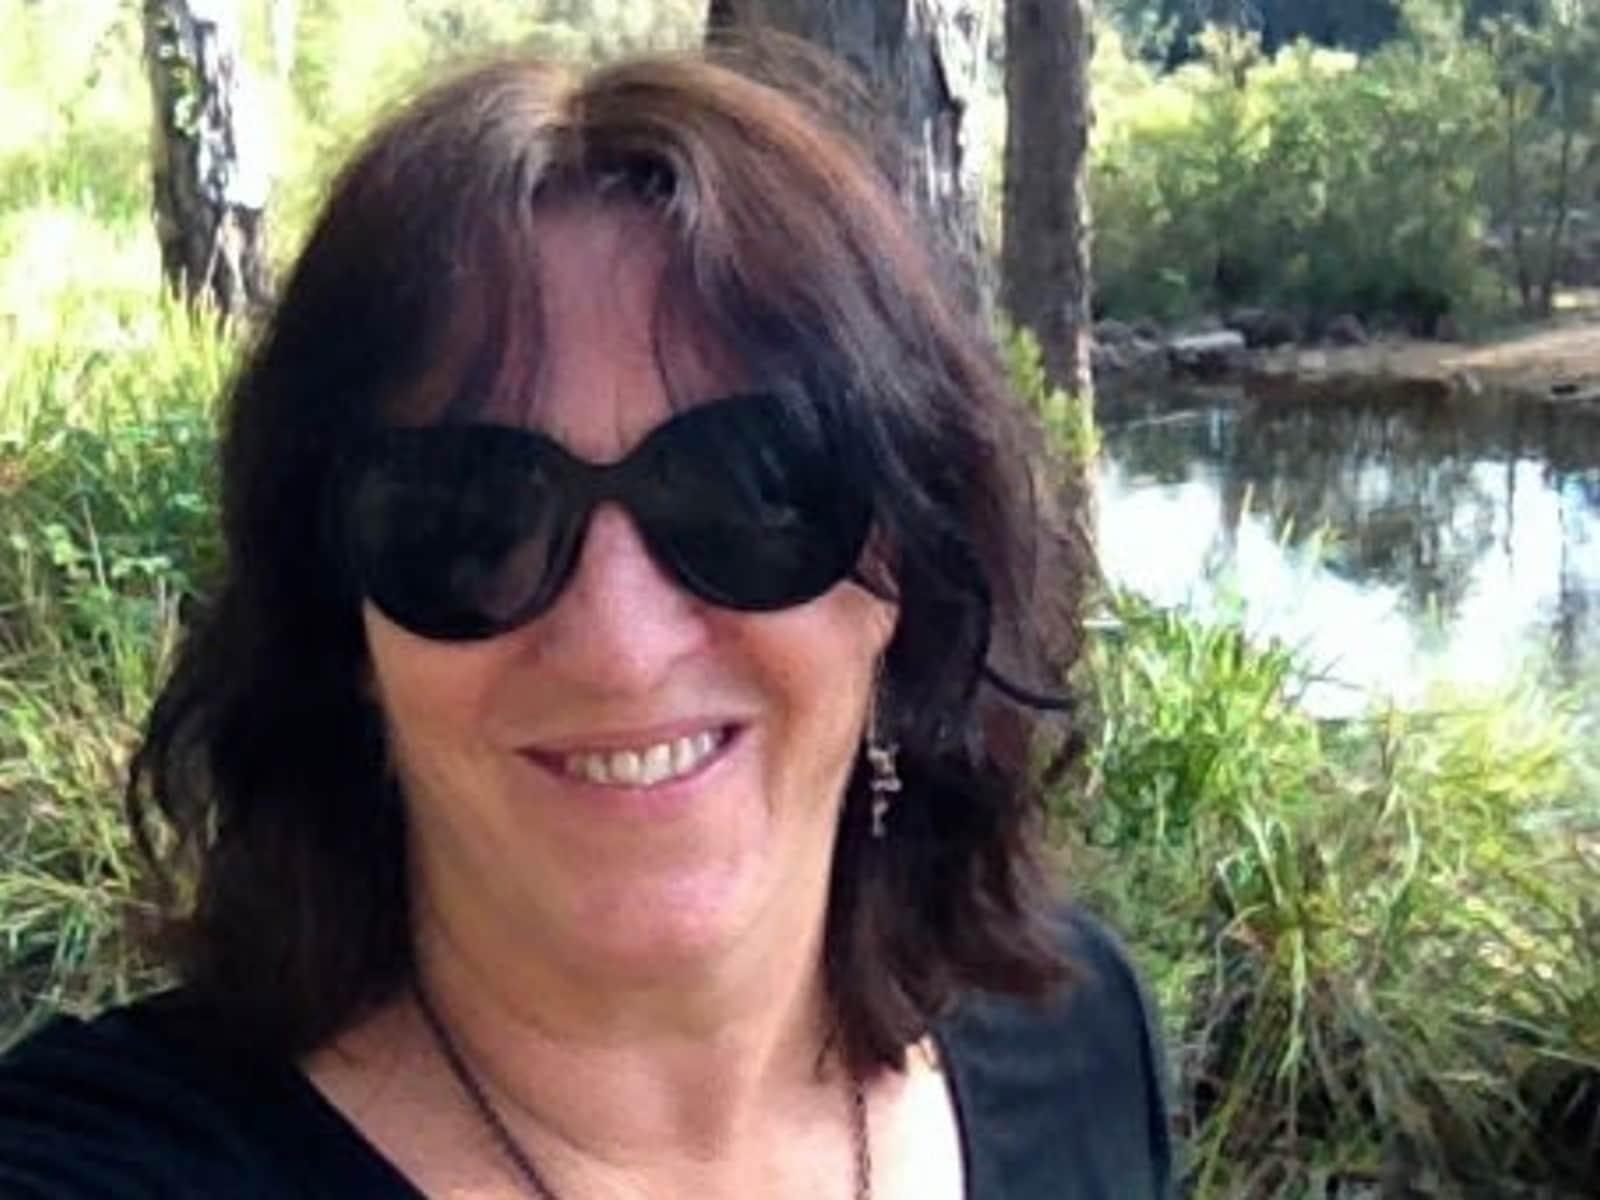 Gail from Nimbin, New South Wales, Australia